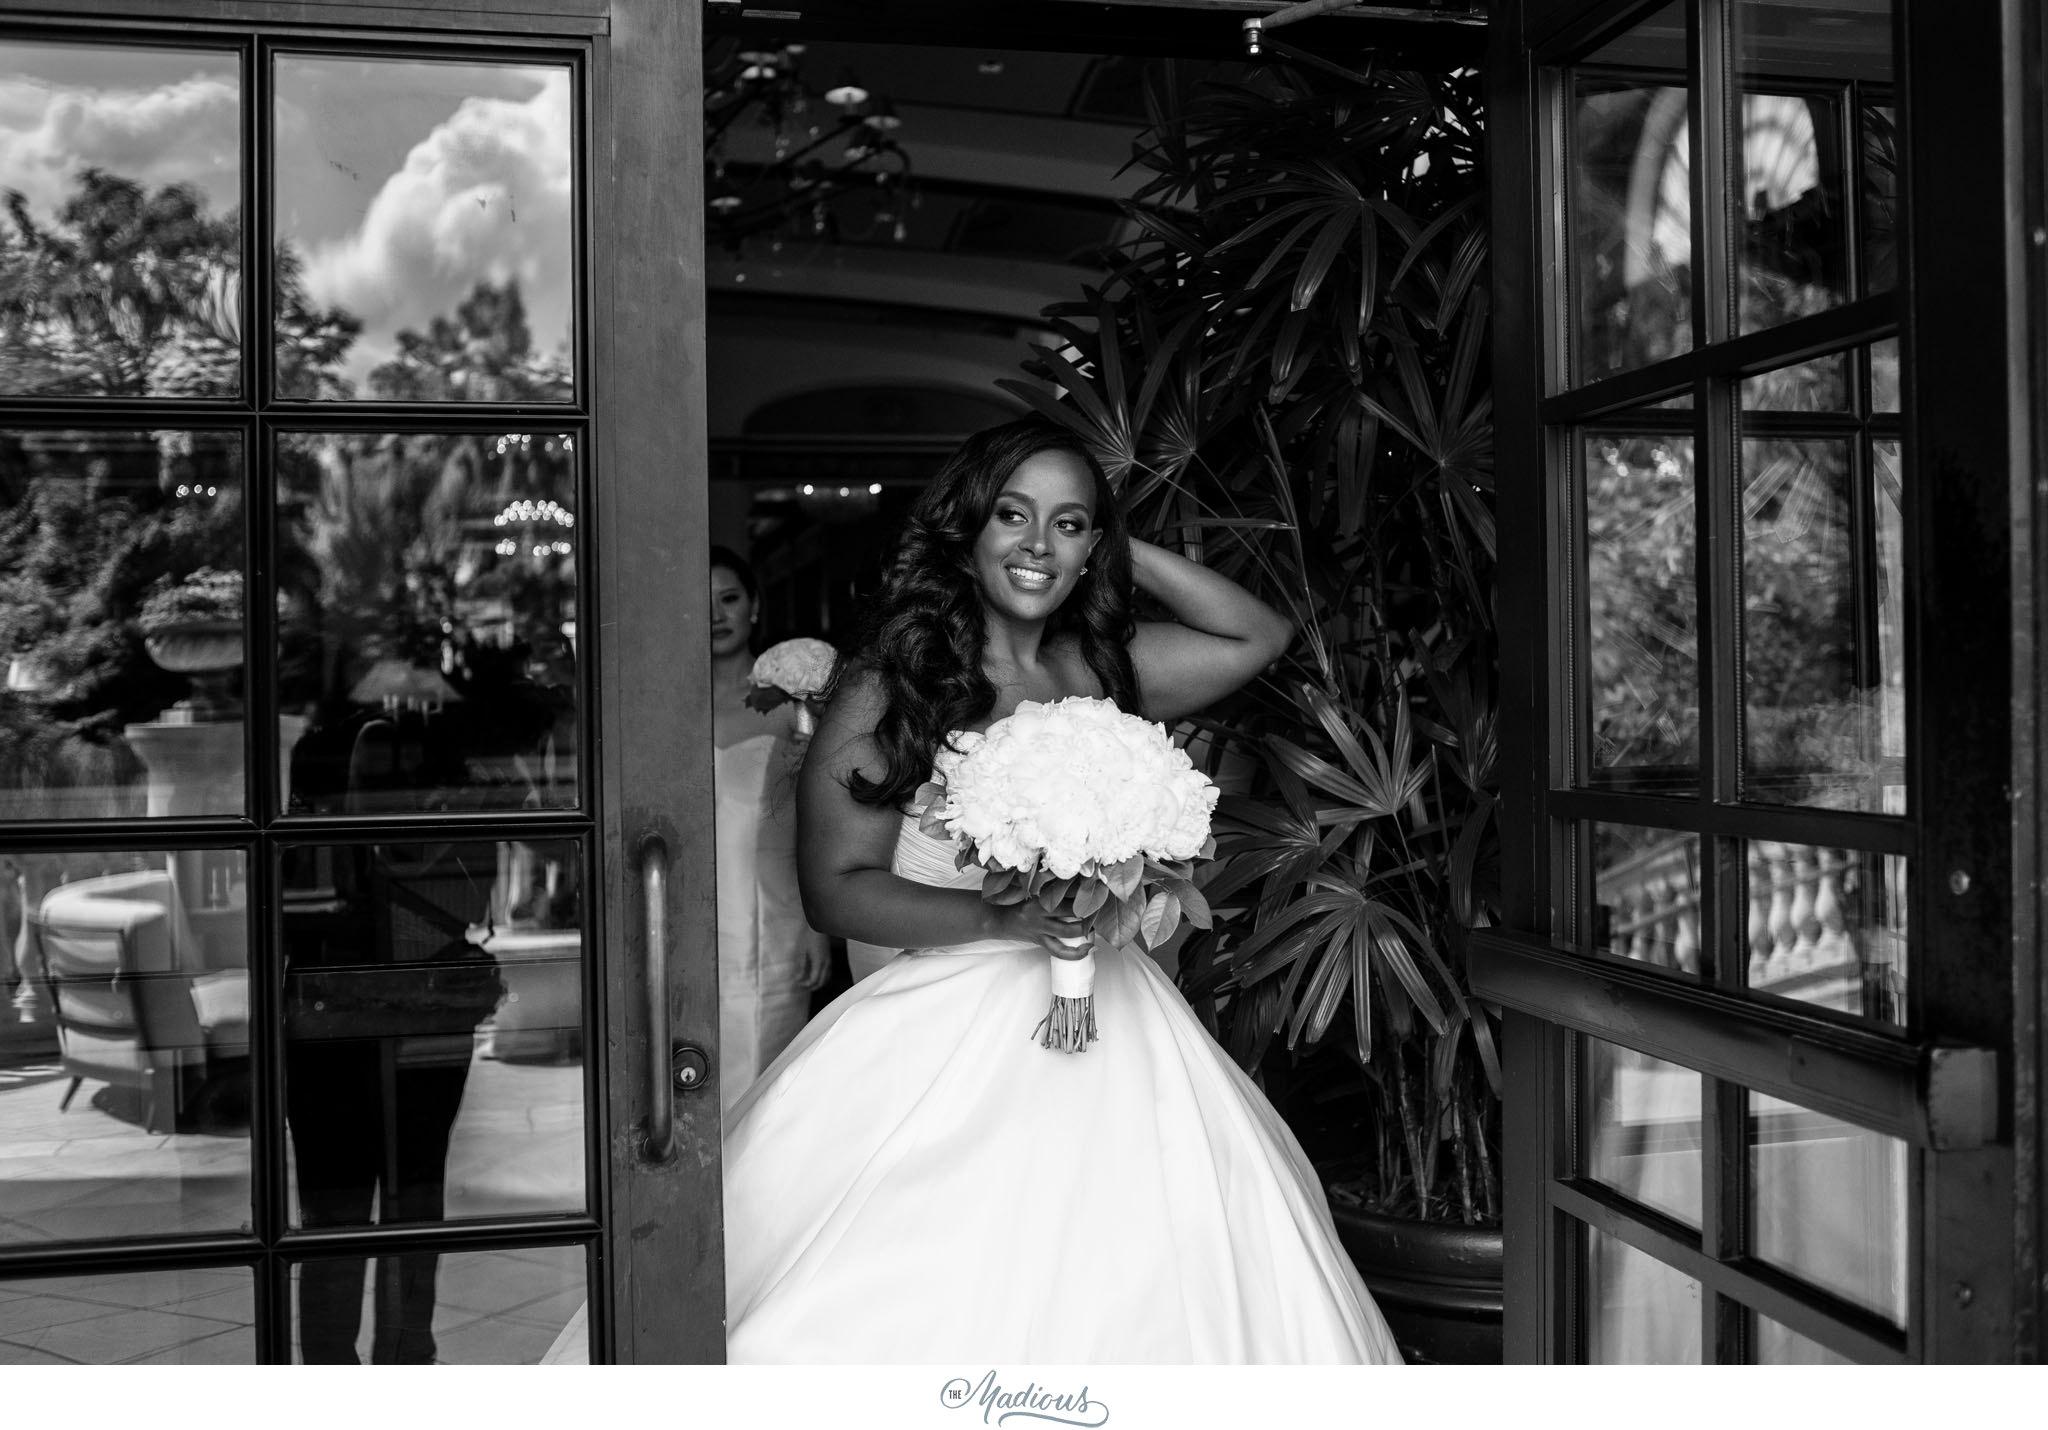 nmwa+wedding,+women+in+the+arts+wedding,+ethiopian+wedding,+dc+wedding+0122.jpg